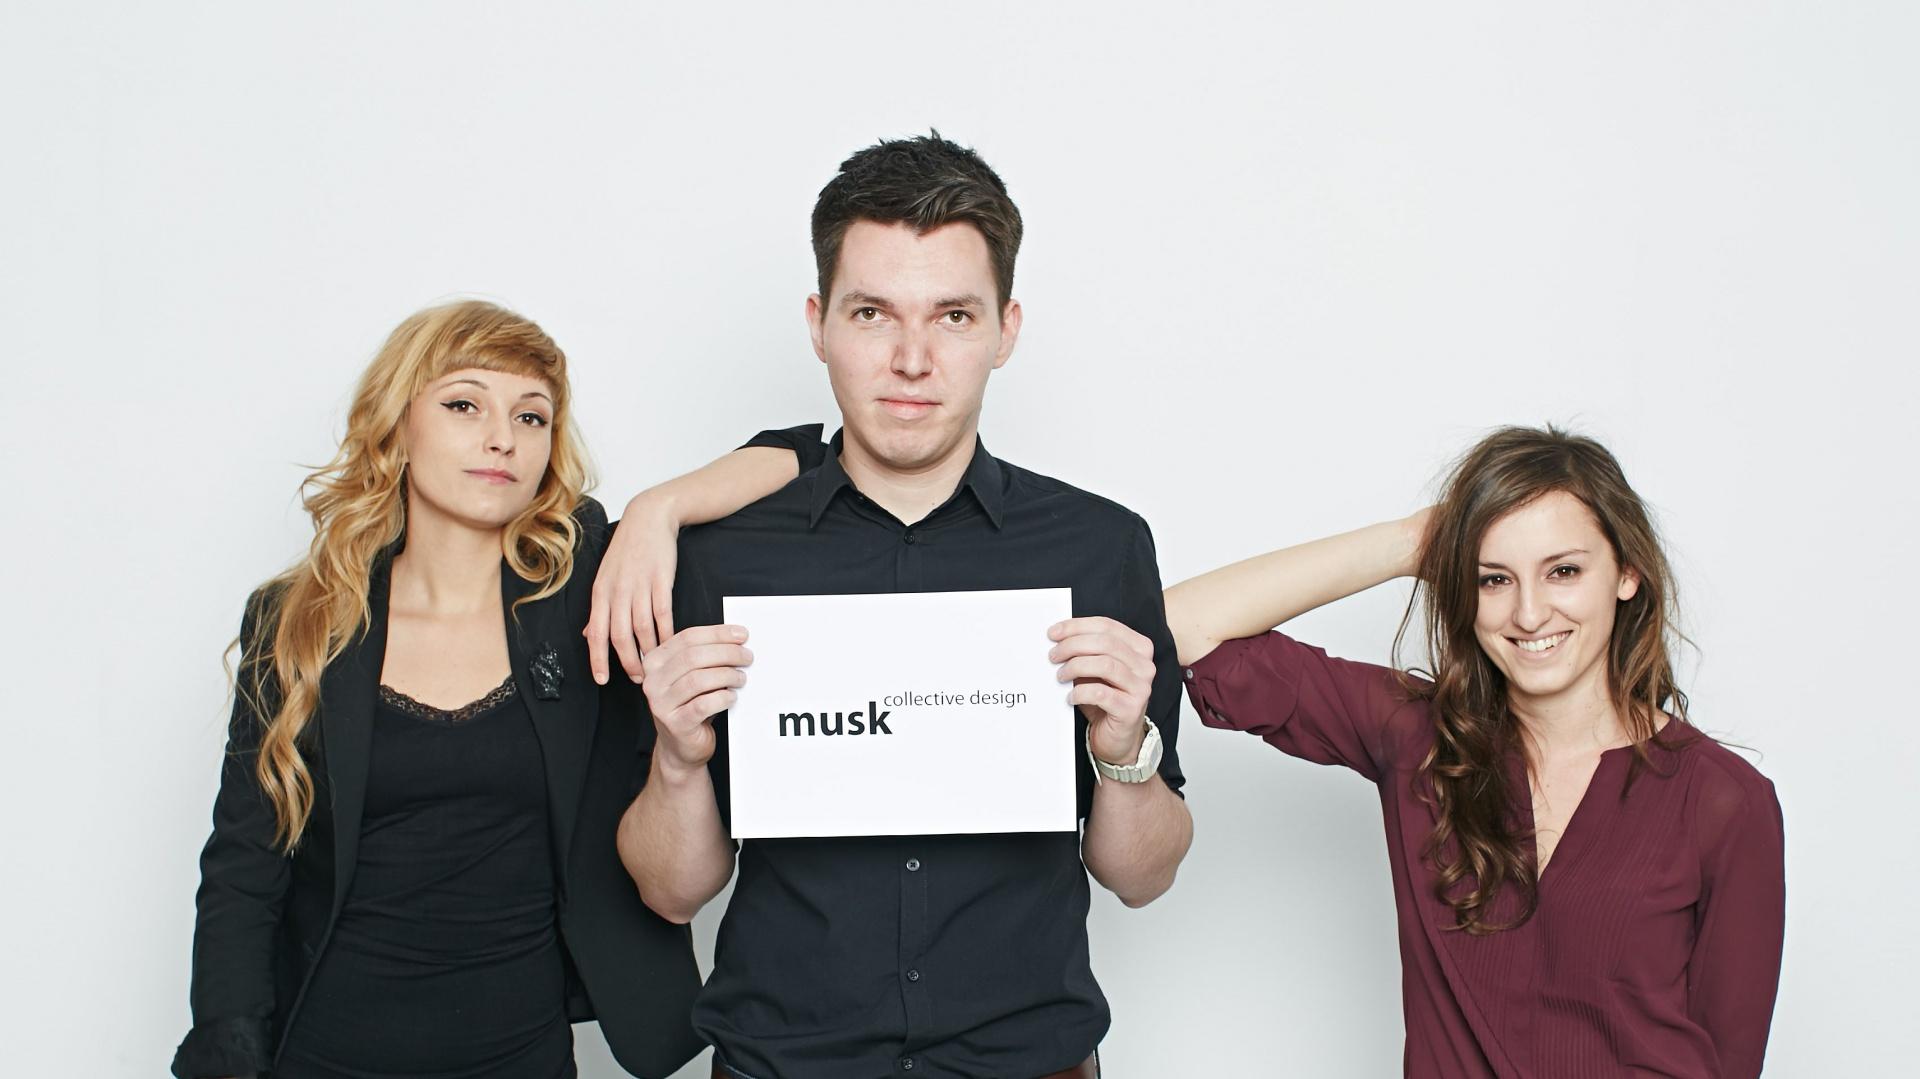 Zespół projektowy Musk Collective Design. Fot. Archiwum